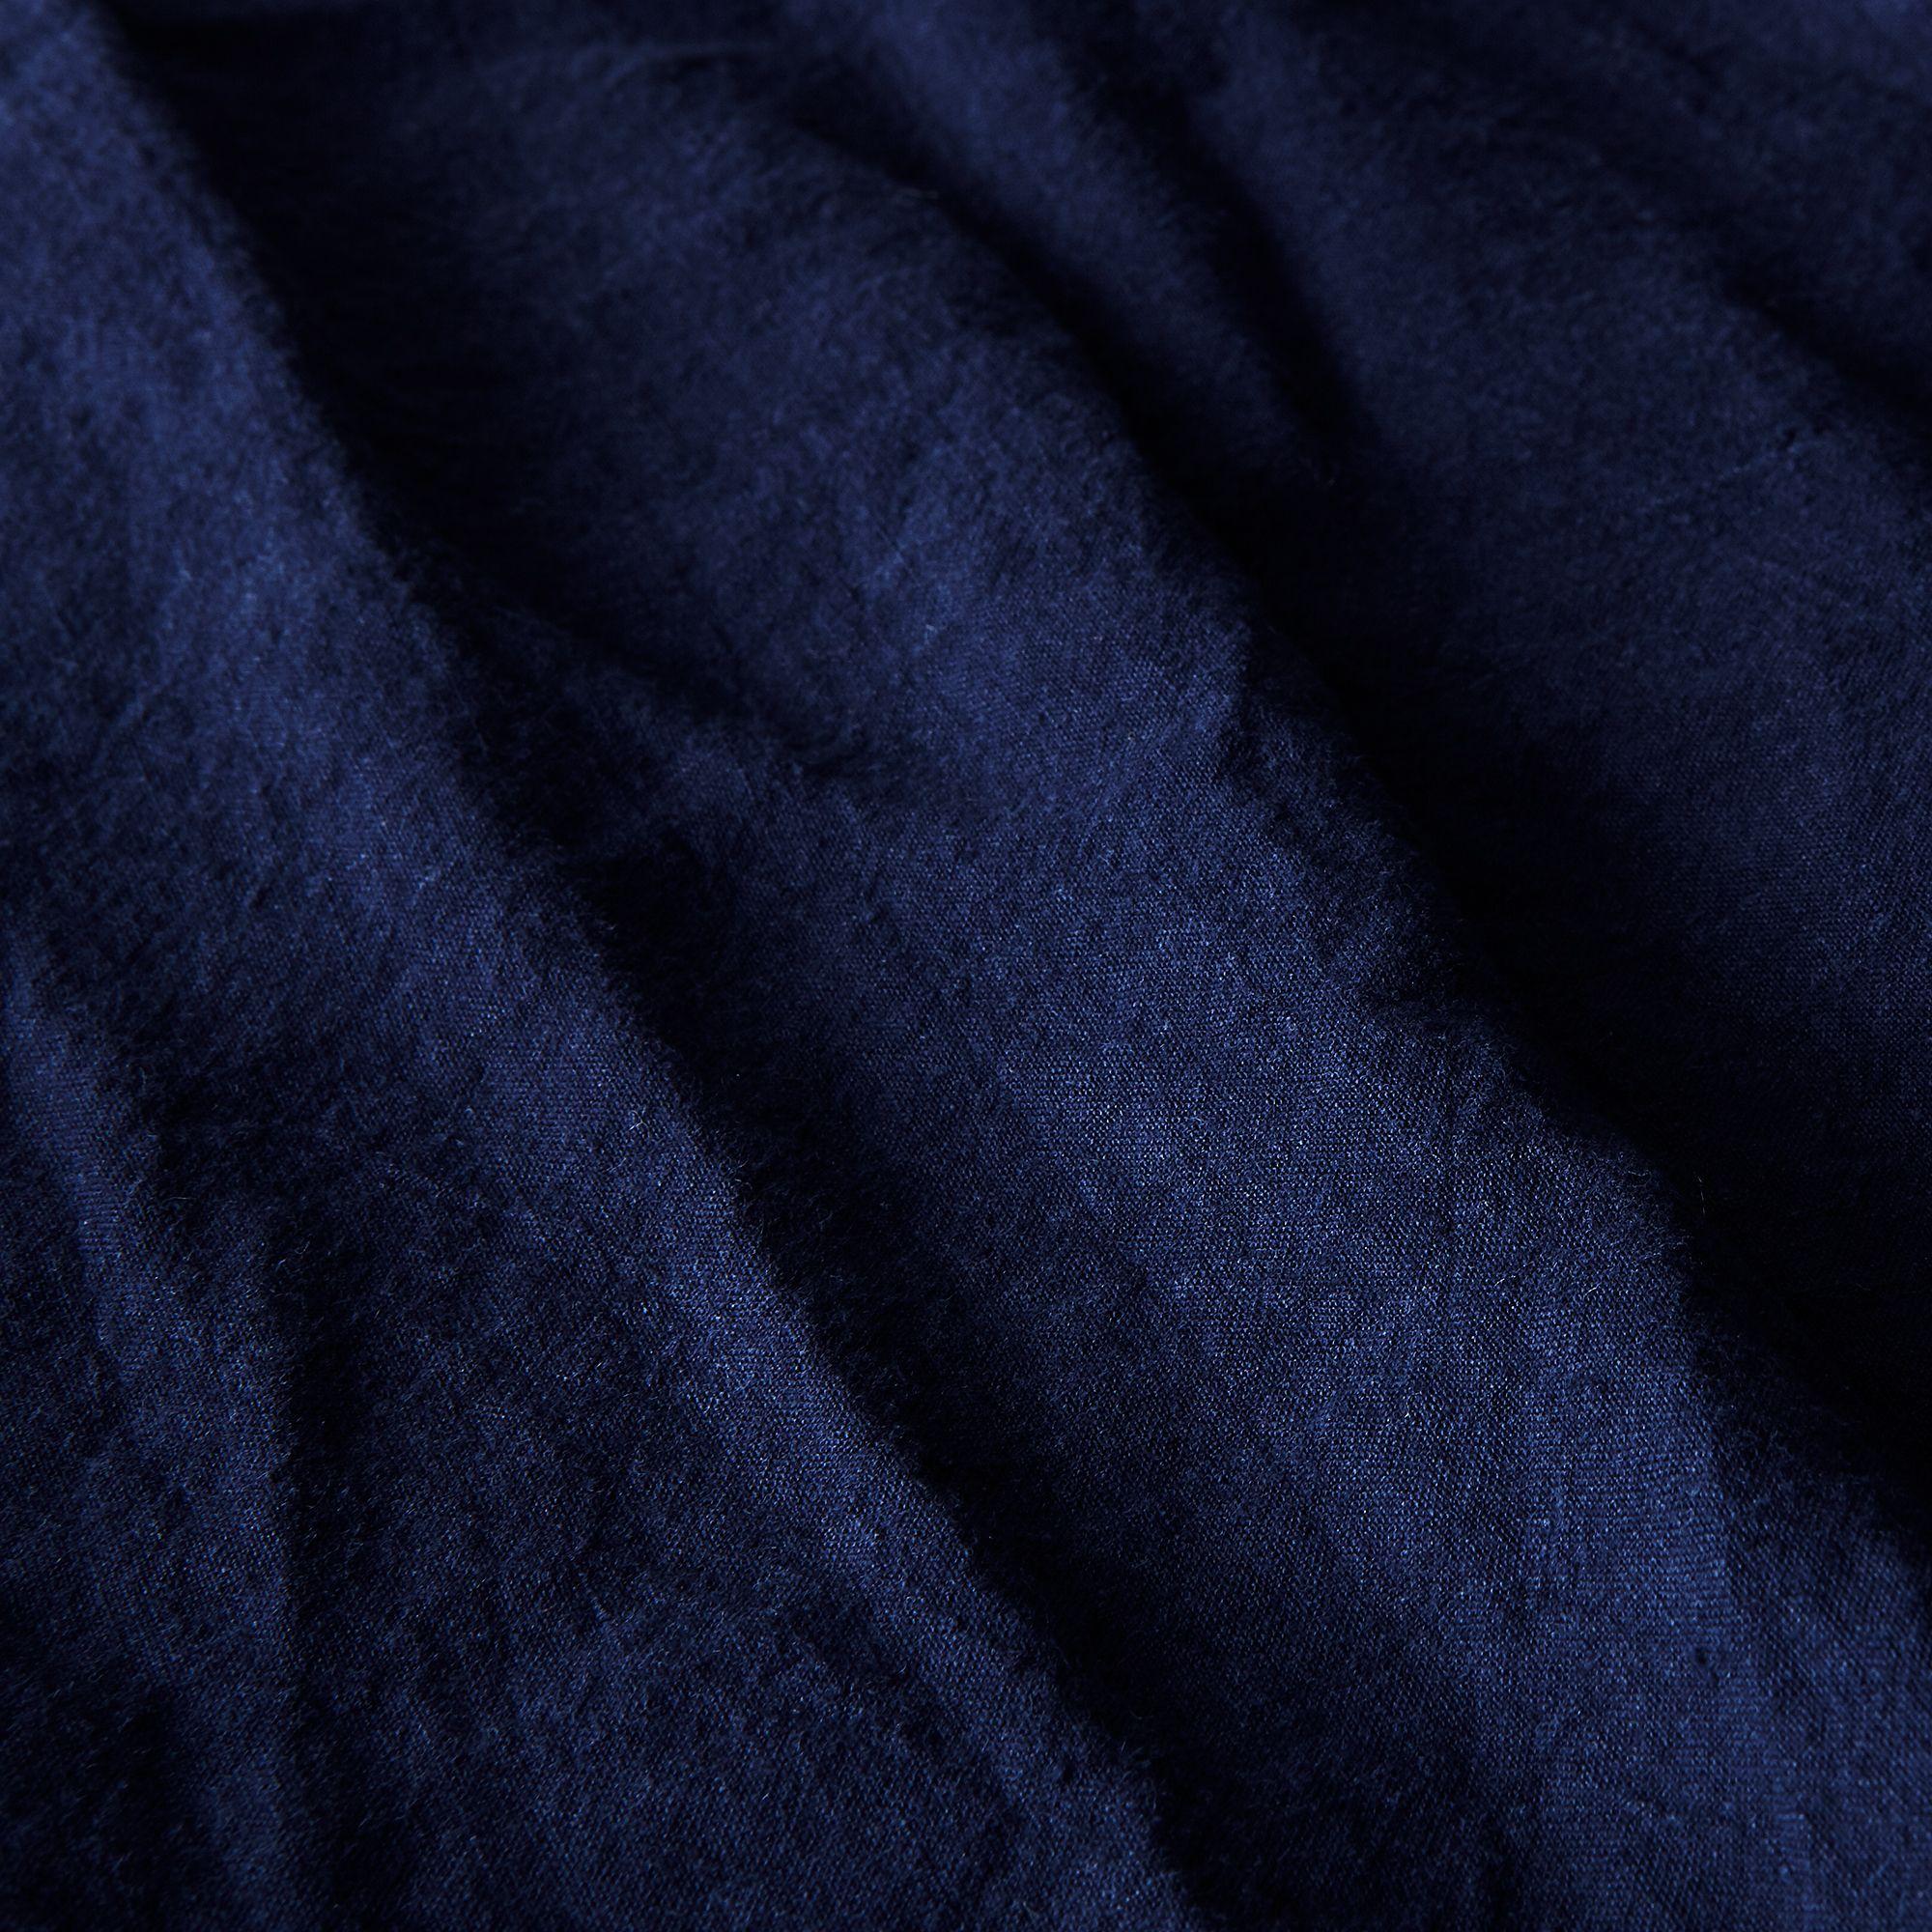 36359cc6 b561 493d bb4c dd723e1c1aca  2017 0711 hawkins new york exclusive linen bedding navy detail silo rocky luten 003 2